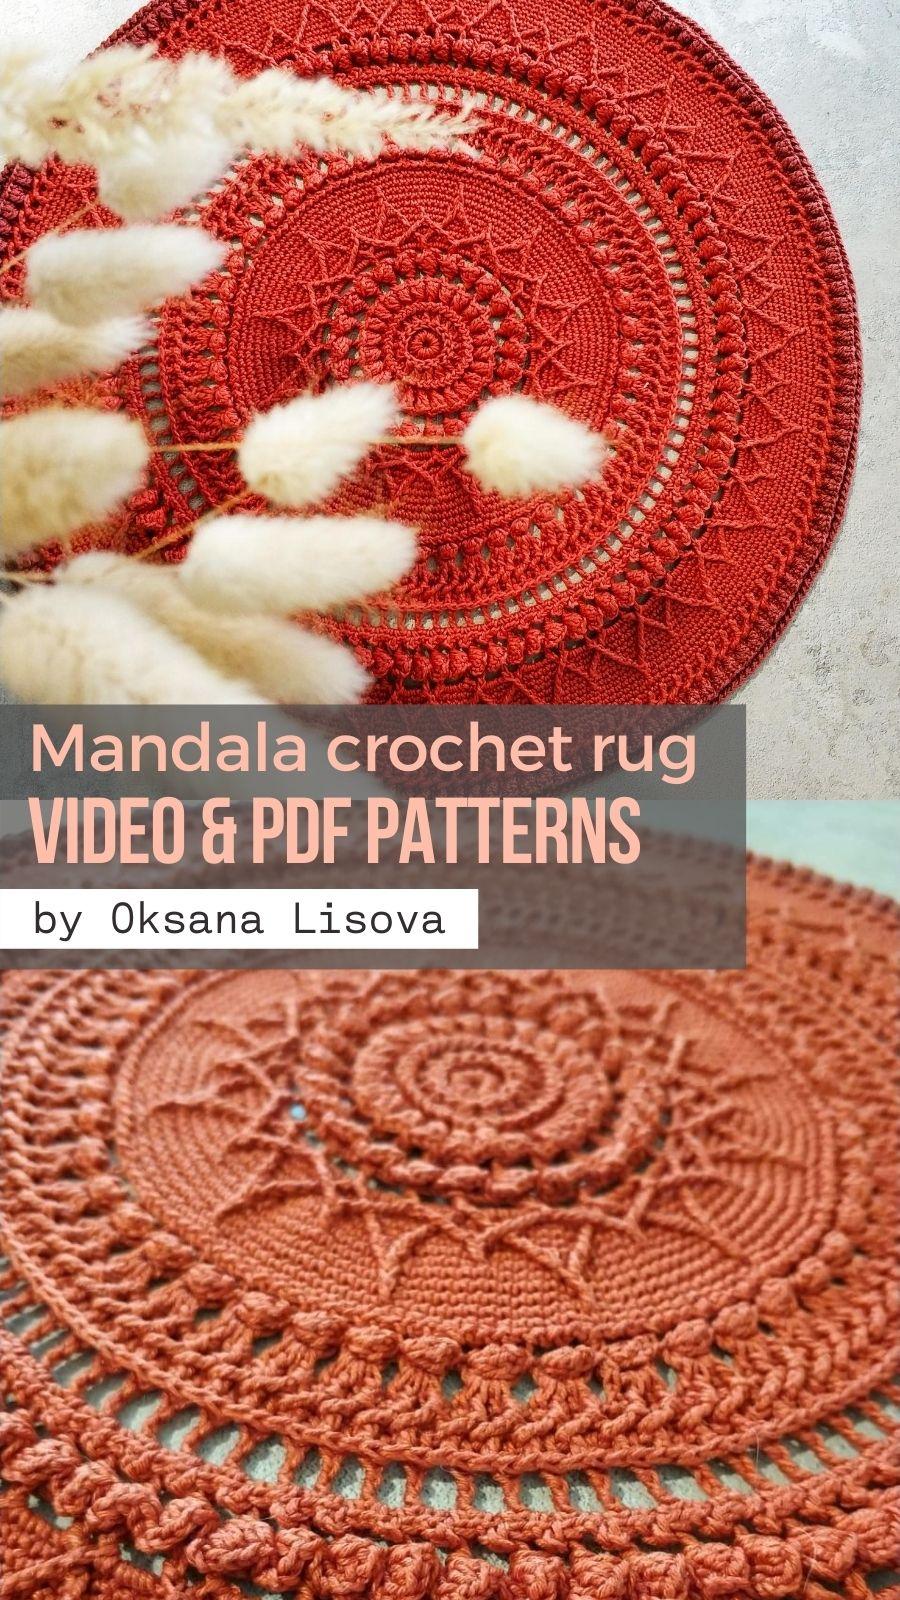 Mandala Crochet Rug Veles By Lisova Oksana Video Pdf Tutorials In 2020 Crochet Rug Crochet Mandala Rugs